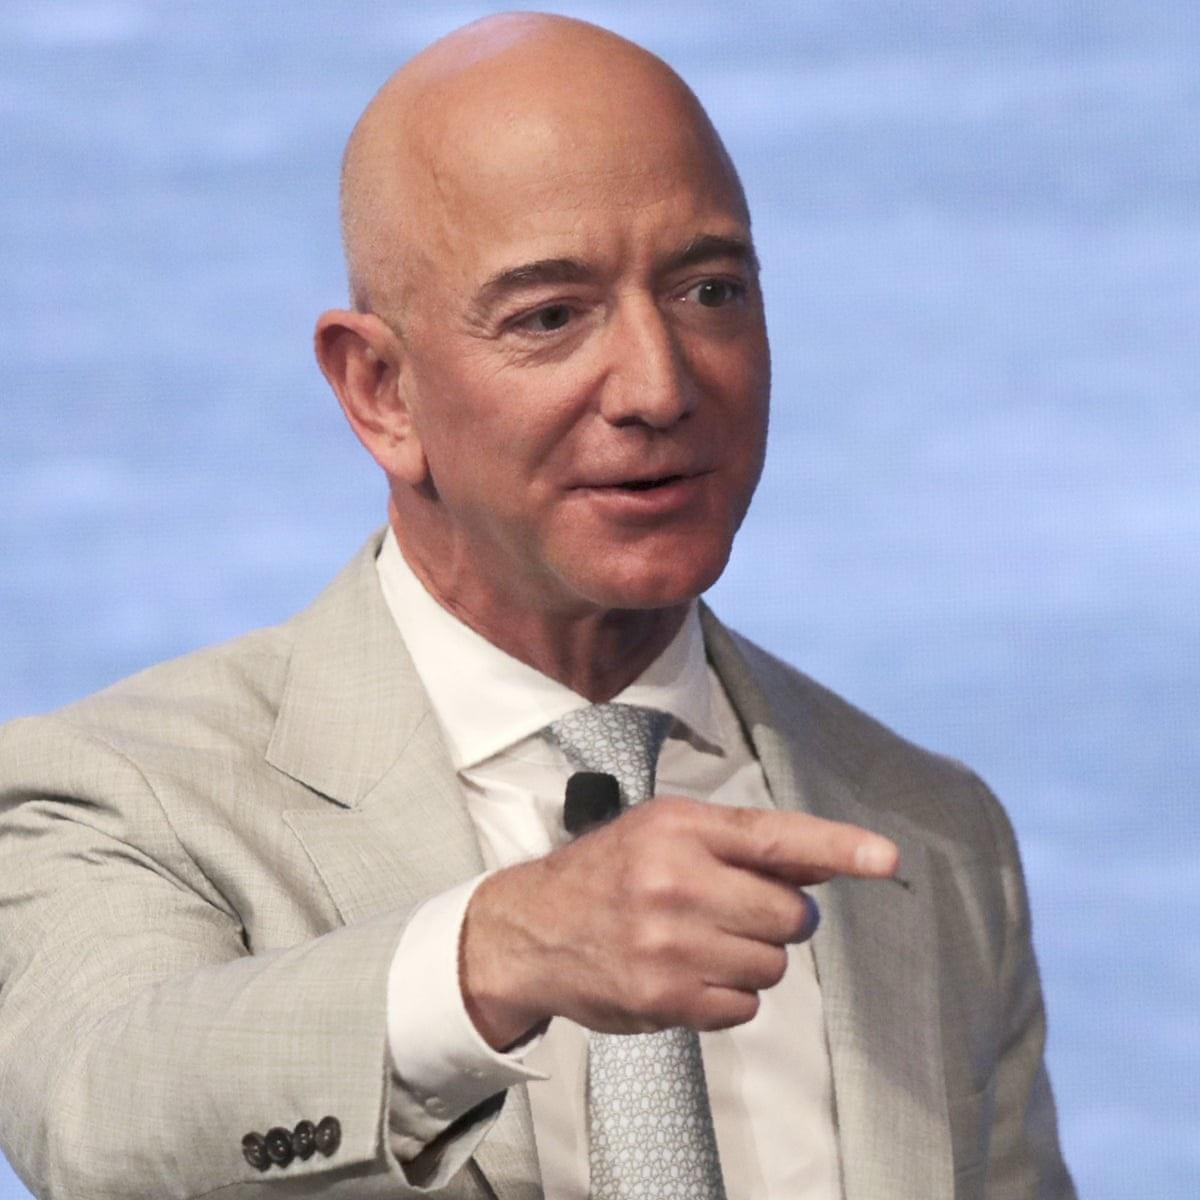 US lawmakers demand Jeff Bezos testify over Amazon's 'possibly criminally  false' statements | Amazon | The Guardian